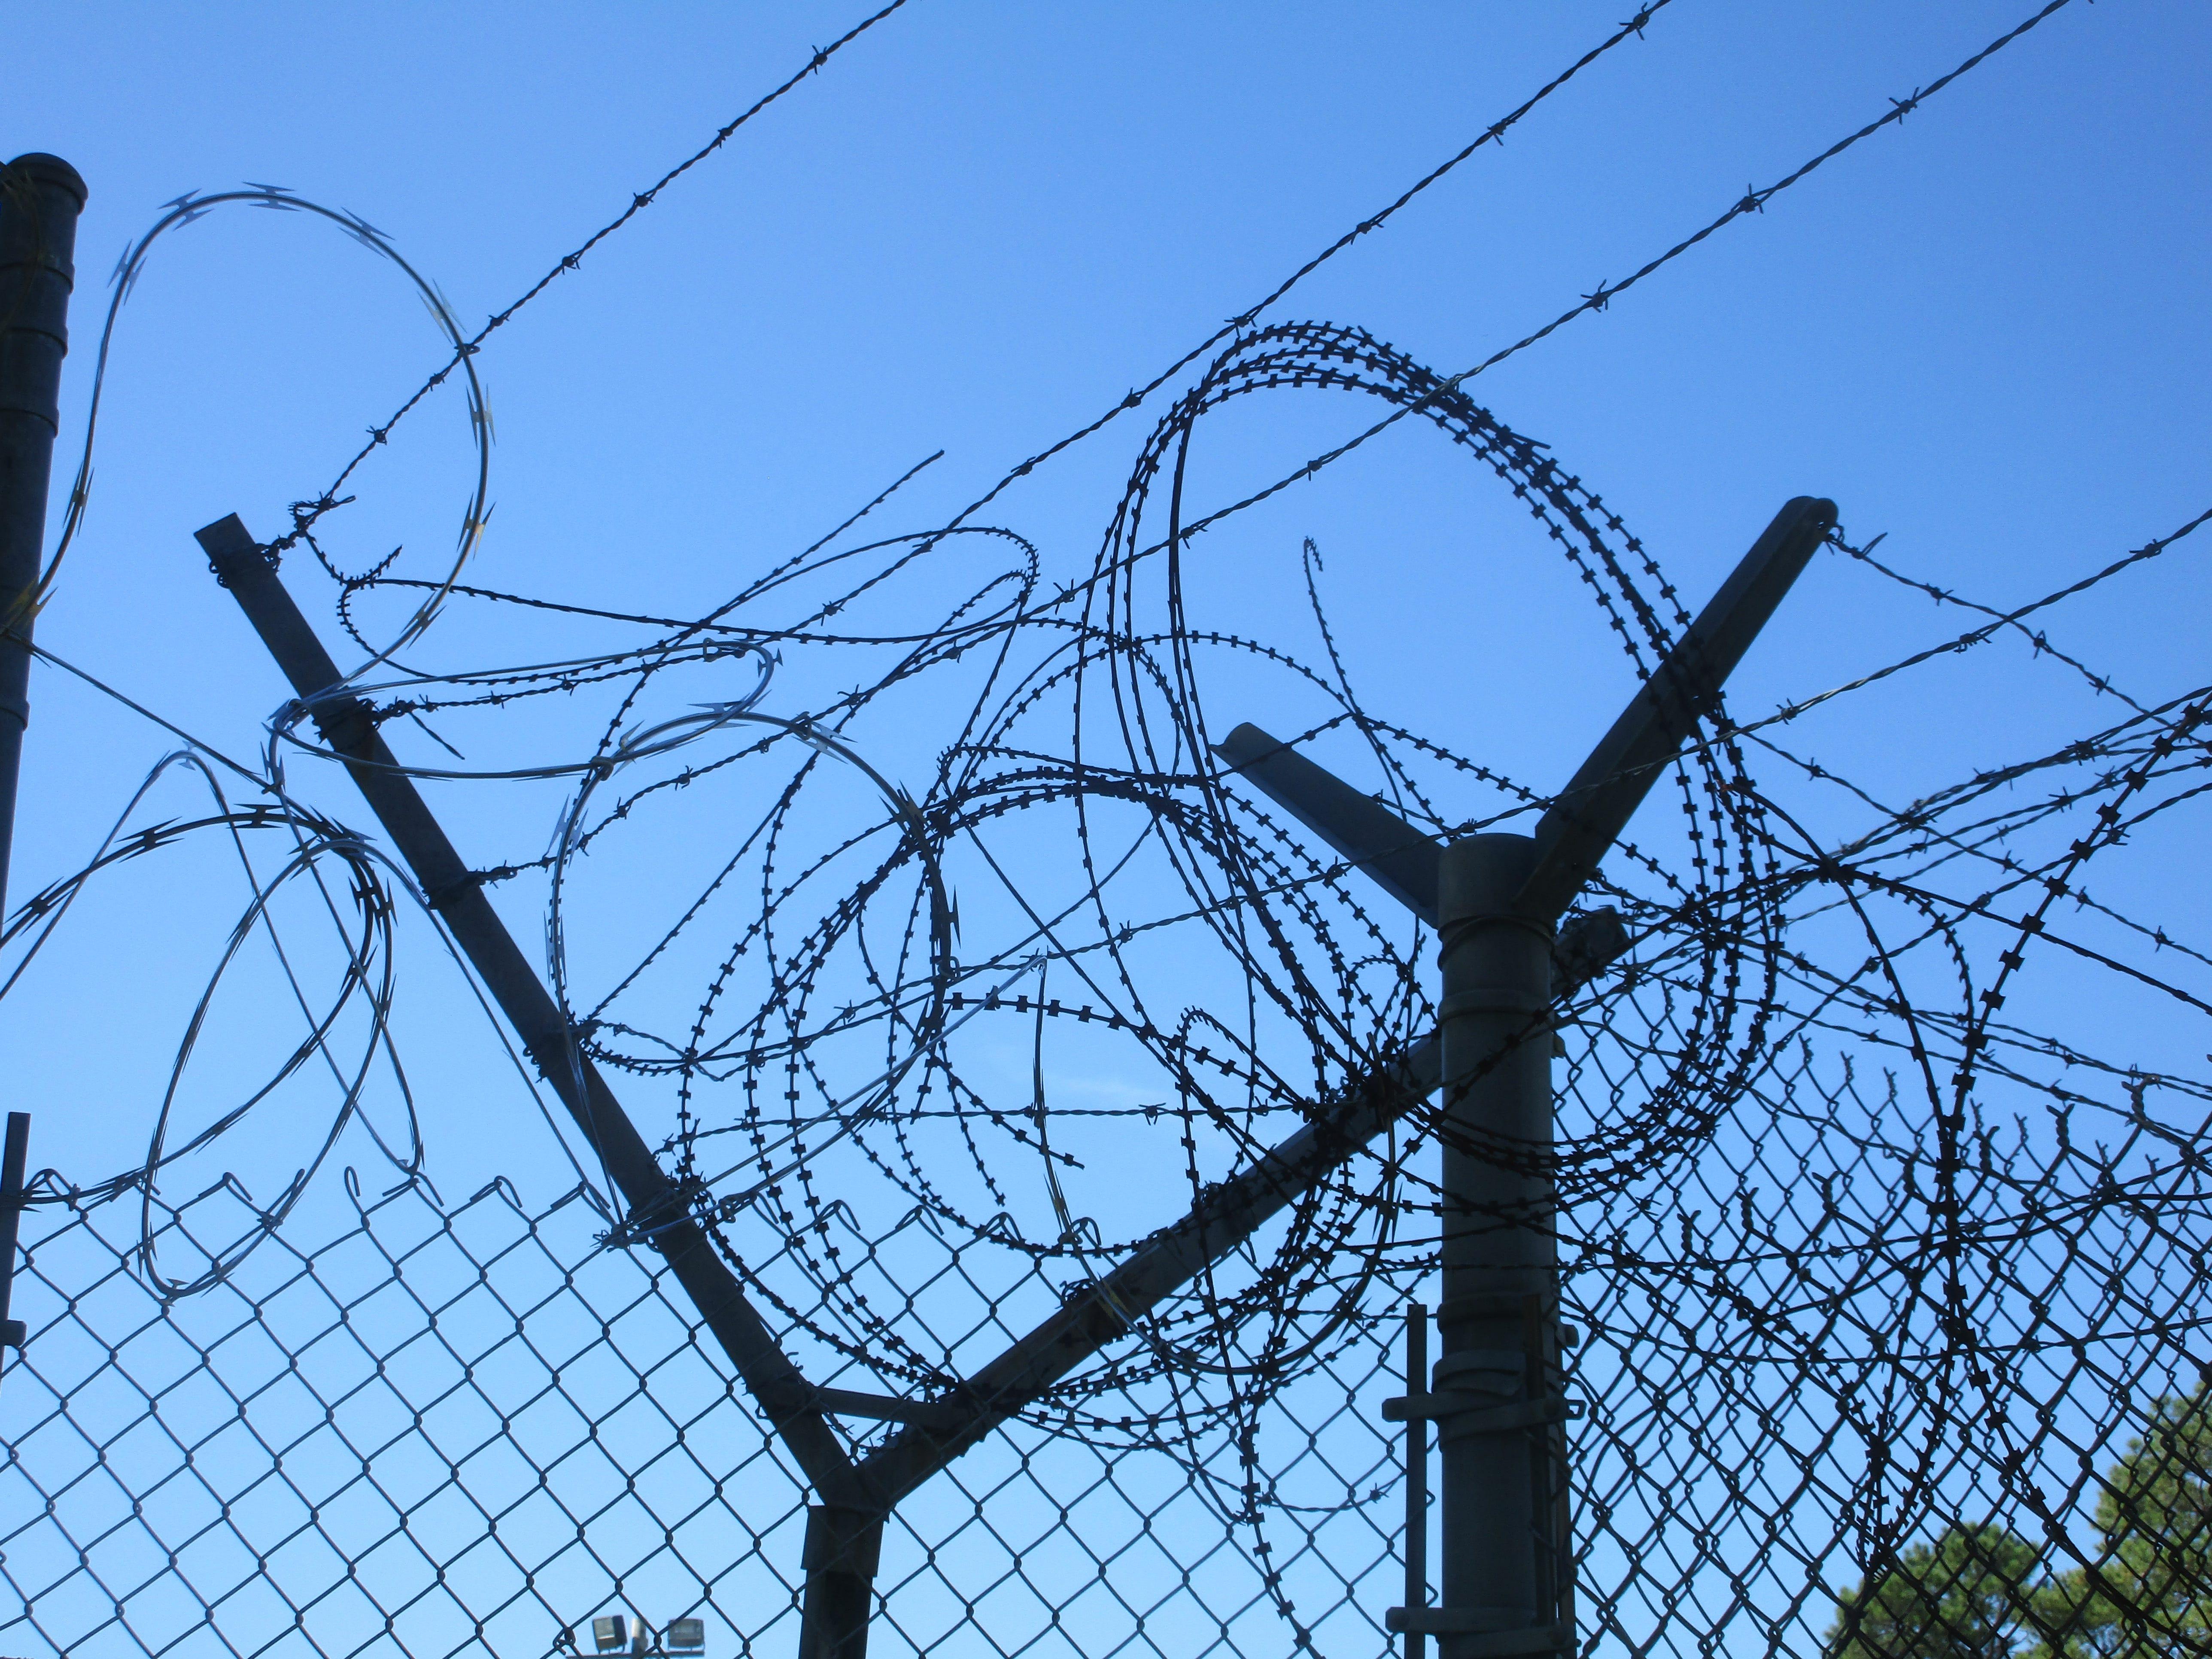 official north carolina travel advice comes from unique prison program